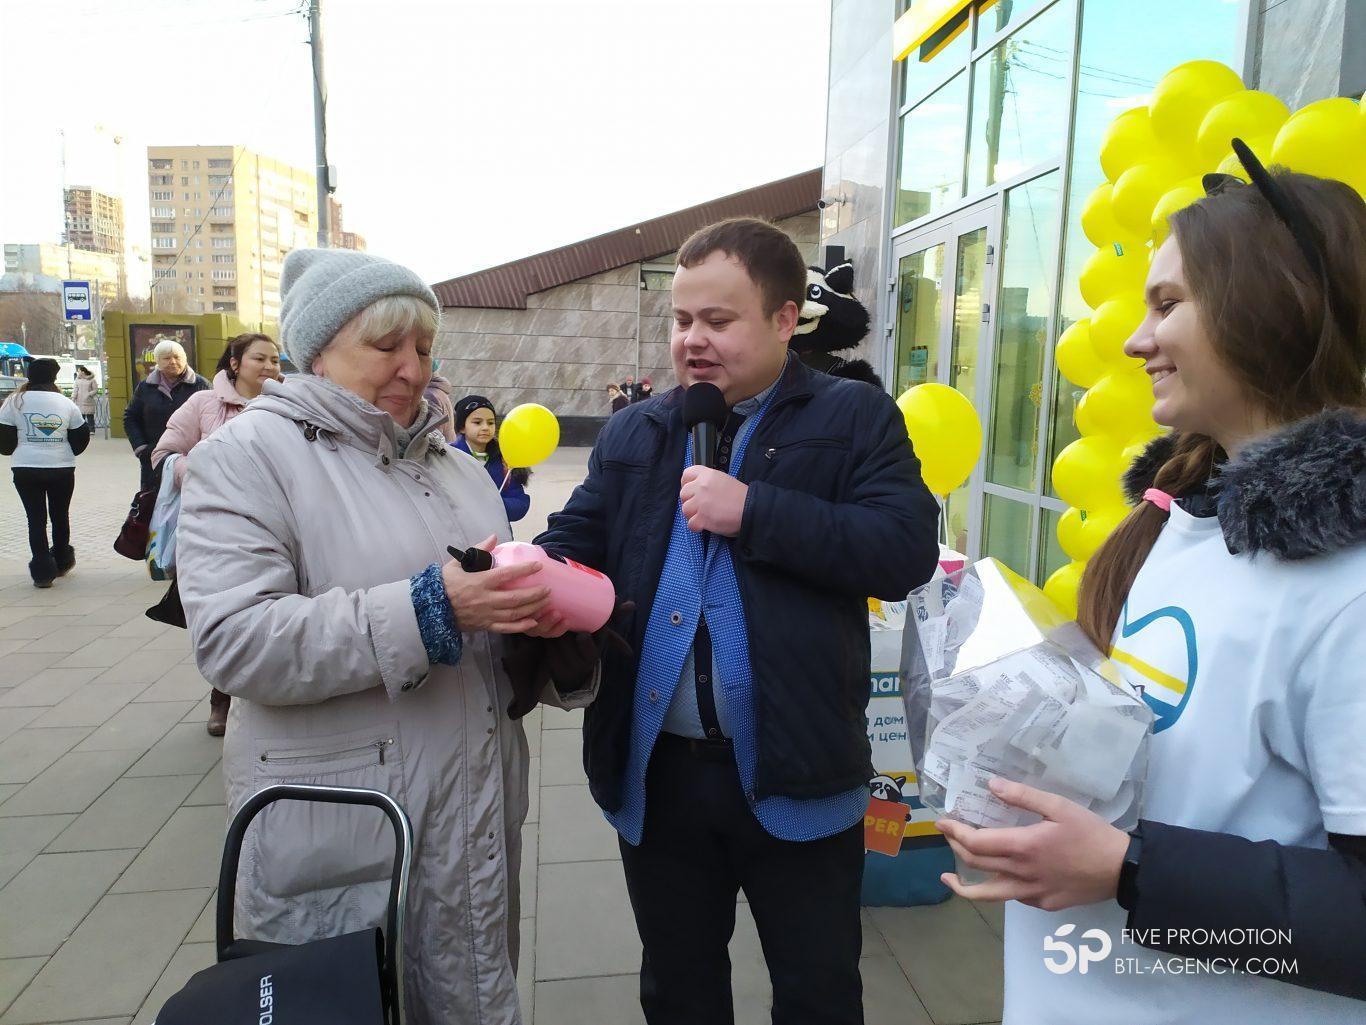 , Праздничное открытие магазина Home Market, Москва, Головинский р-н.